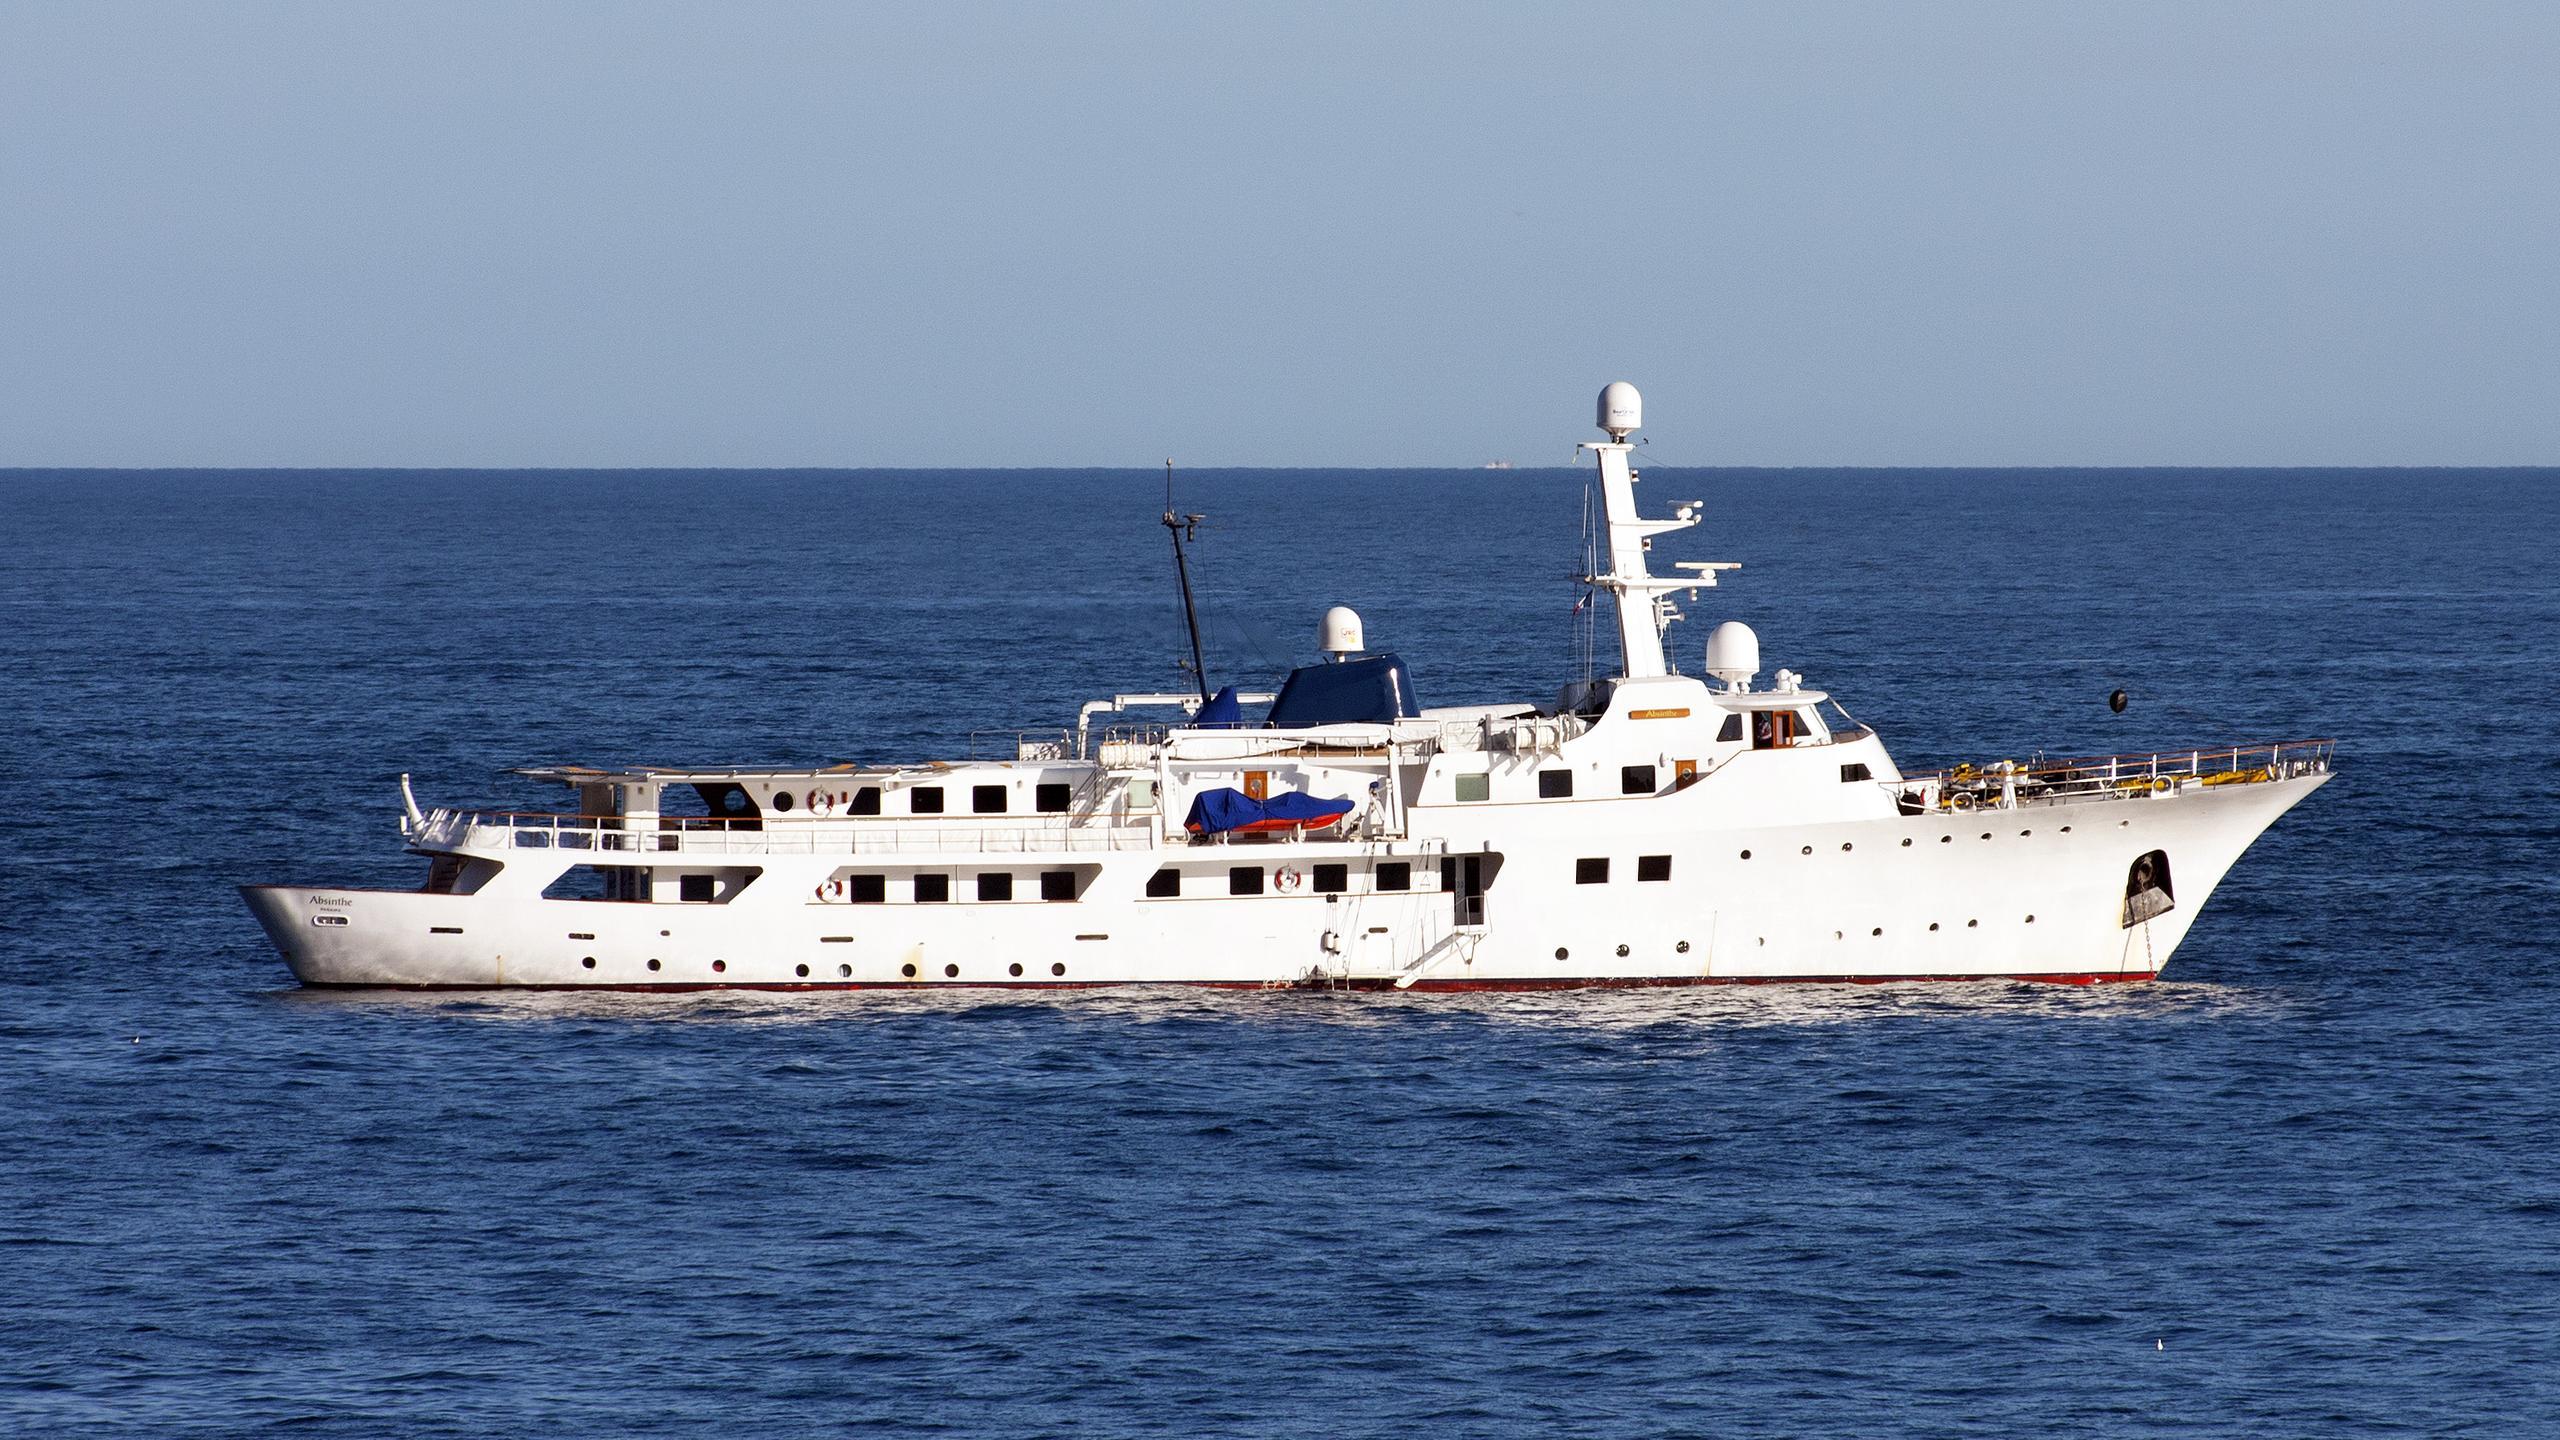 voyager-explorer-yacht-celaya-1973-62m-profile